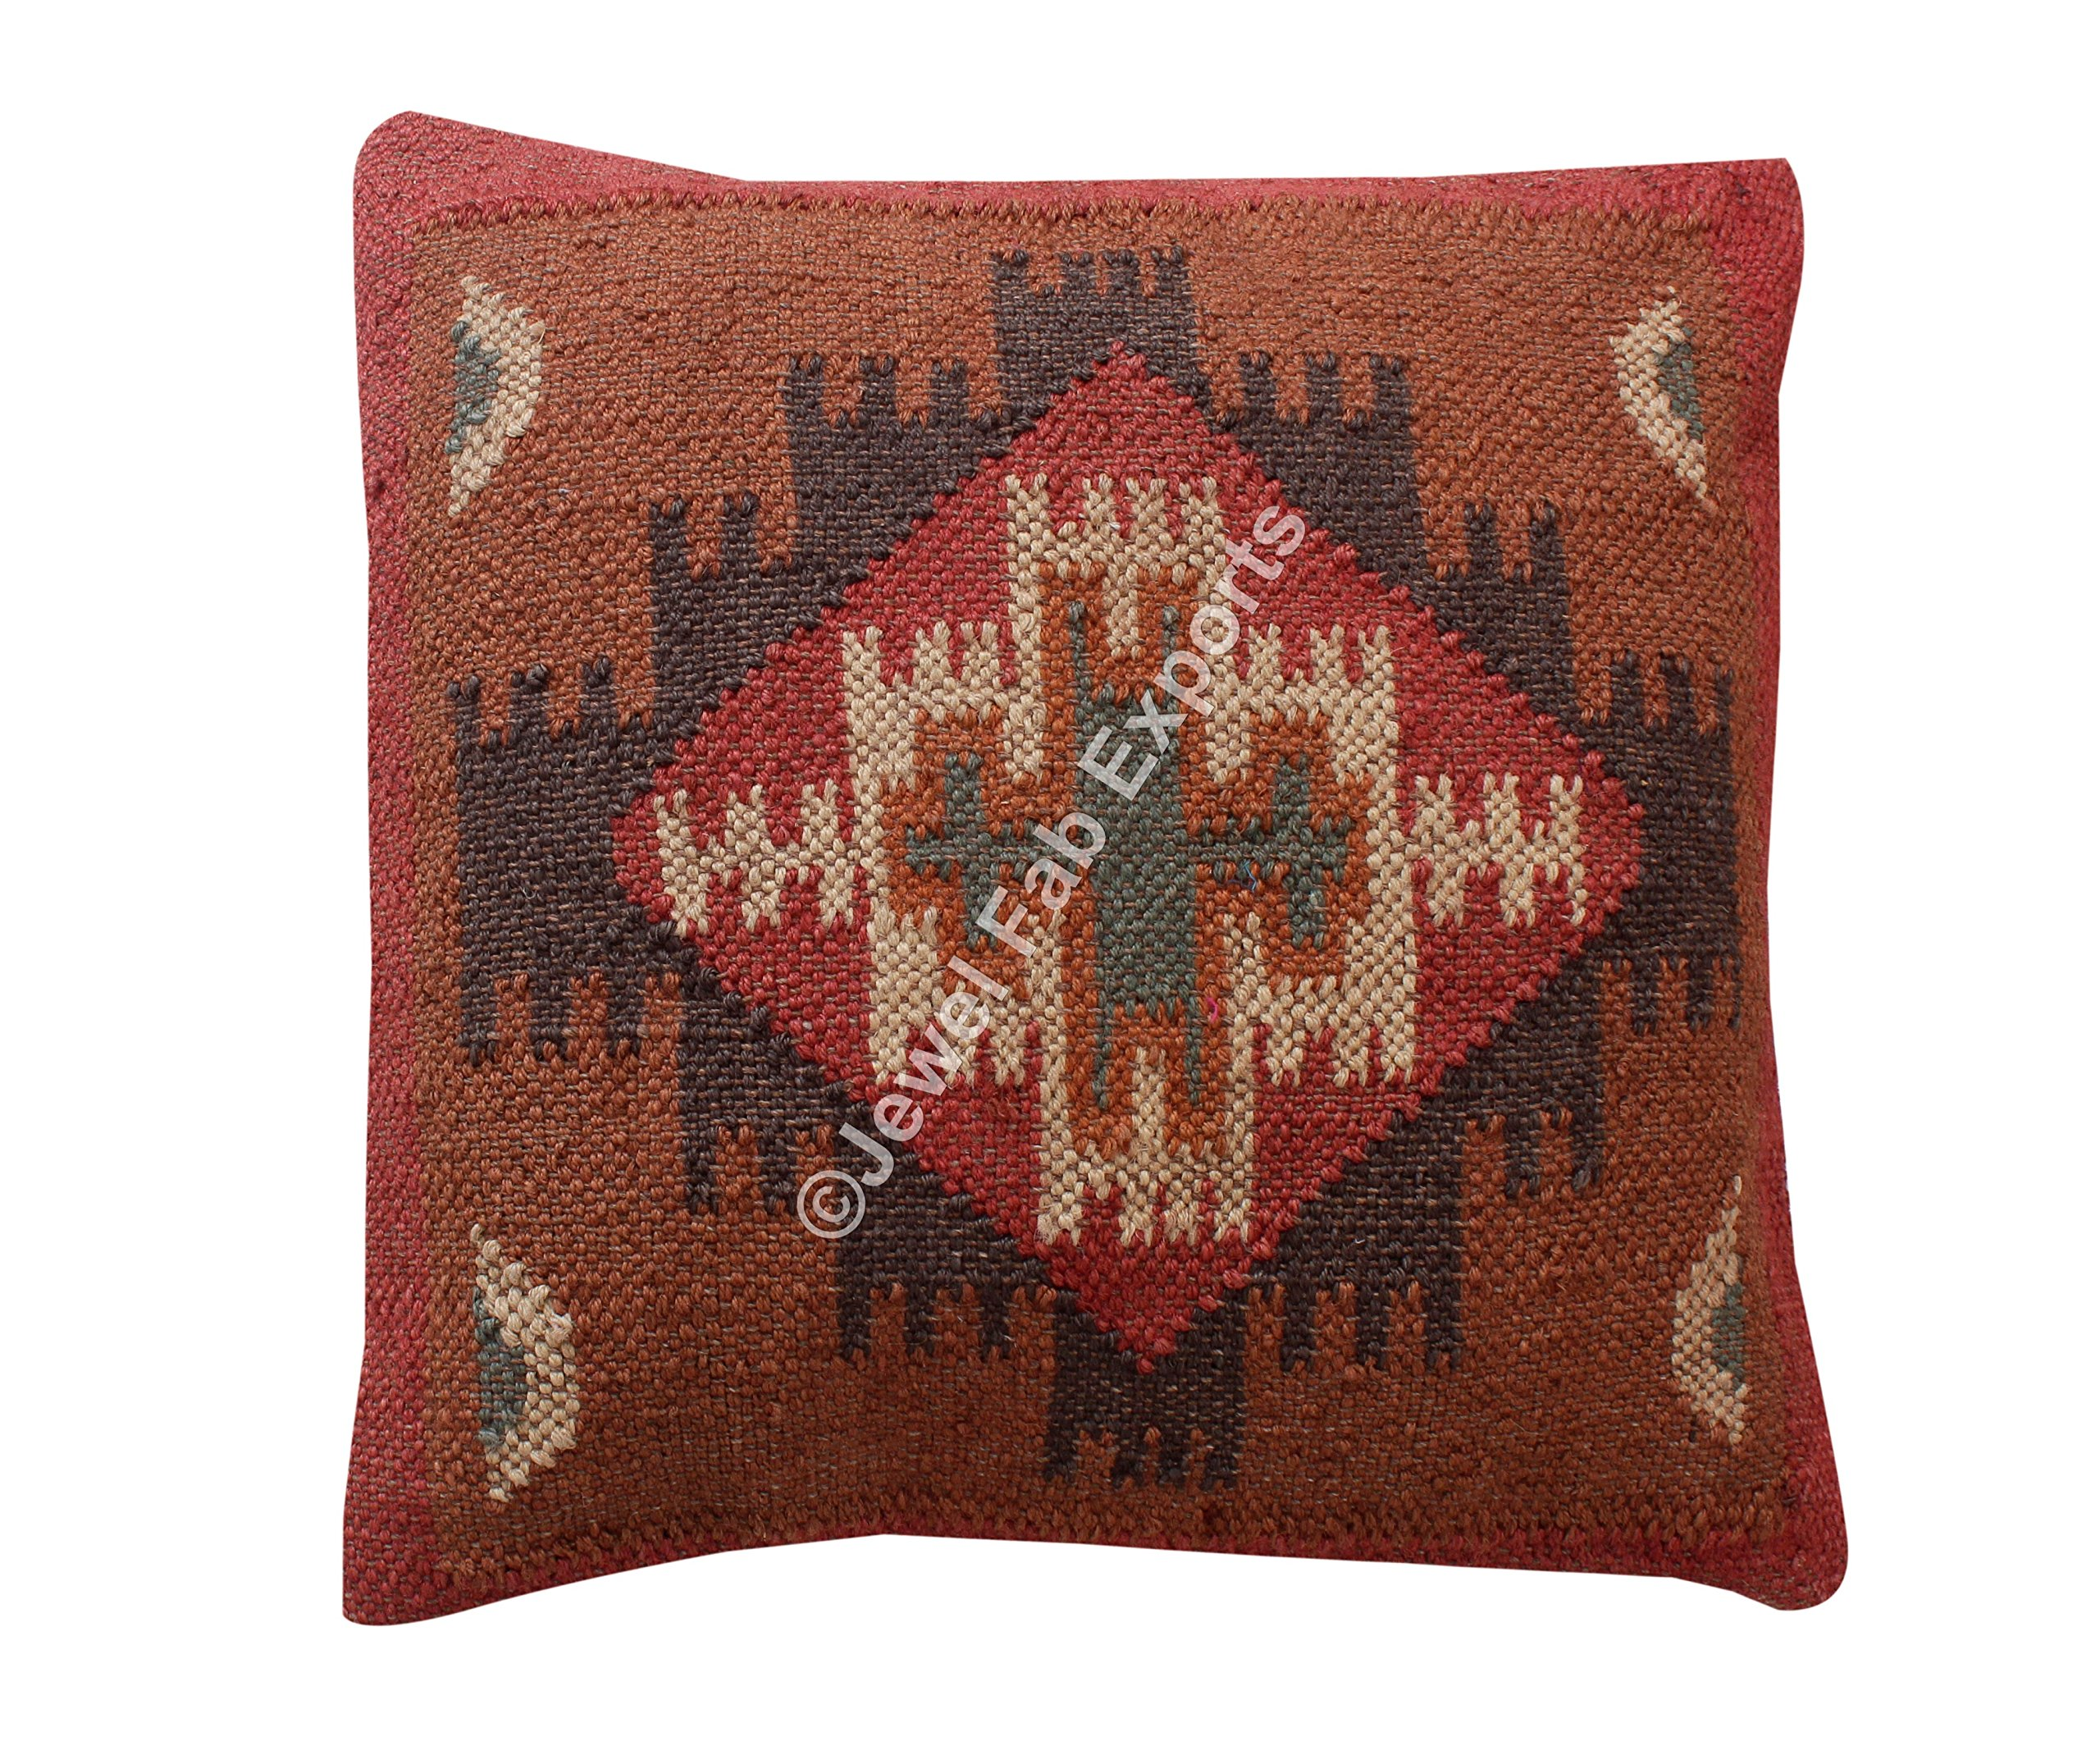 Indian Set Of 5 Jute Cushions Handwoven Kilim Pillow, Jute Euro Sham Kilim Pillow sham Jute Pillow sham Living Room Cushion Cover Jute Kilim cushion cover Hand Woven Jute Cushion cover by Jewel Fab Art